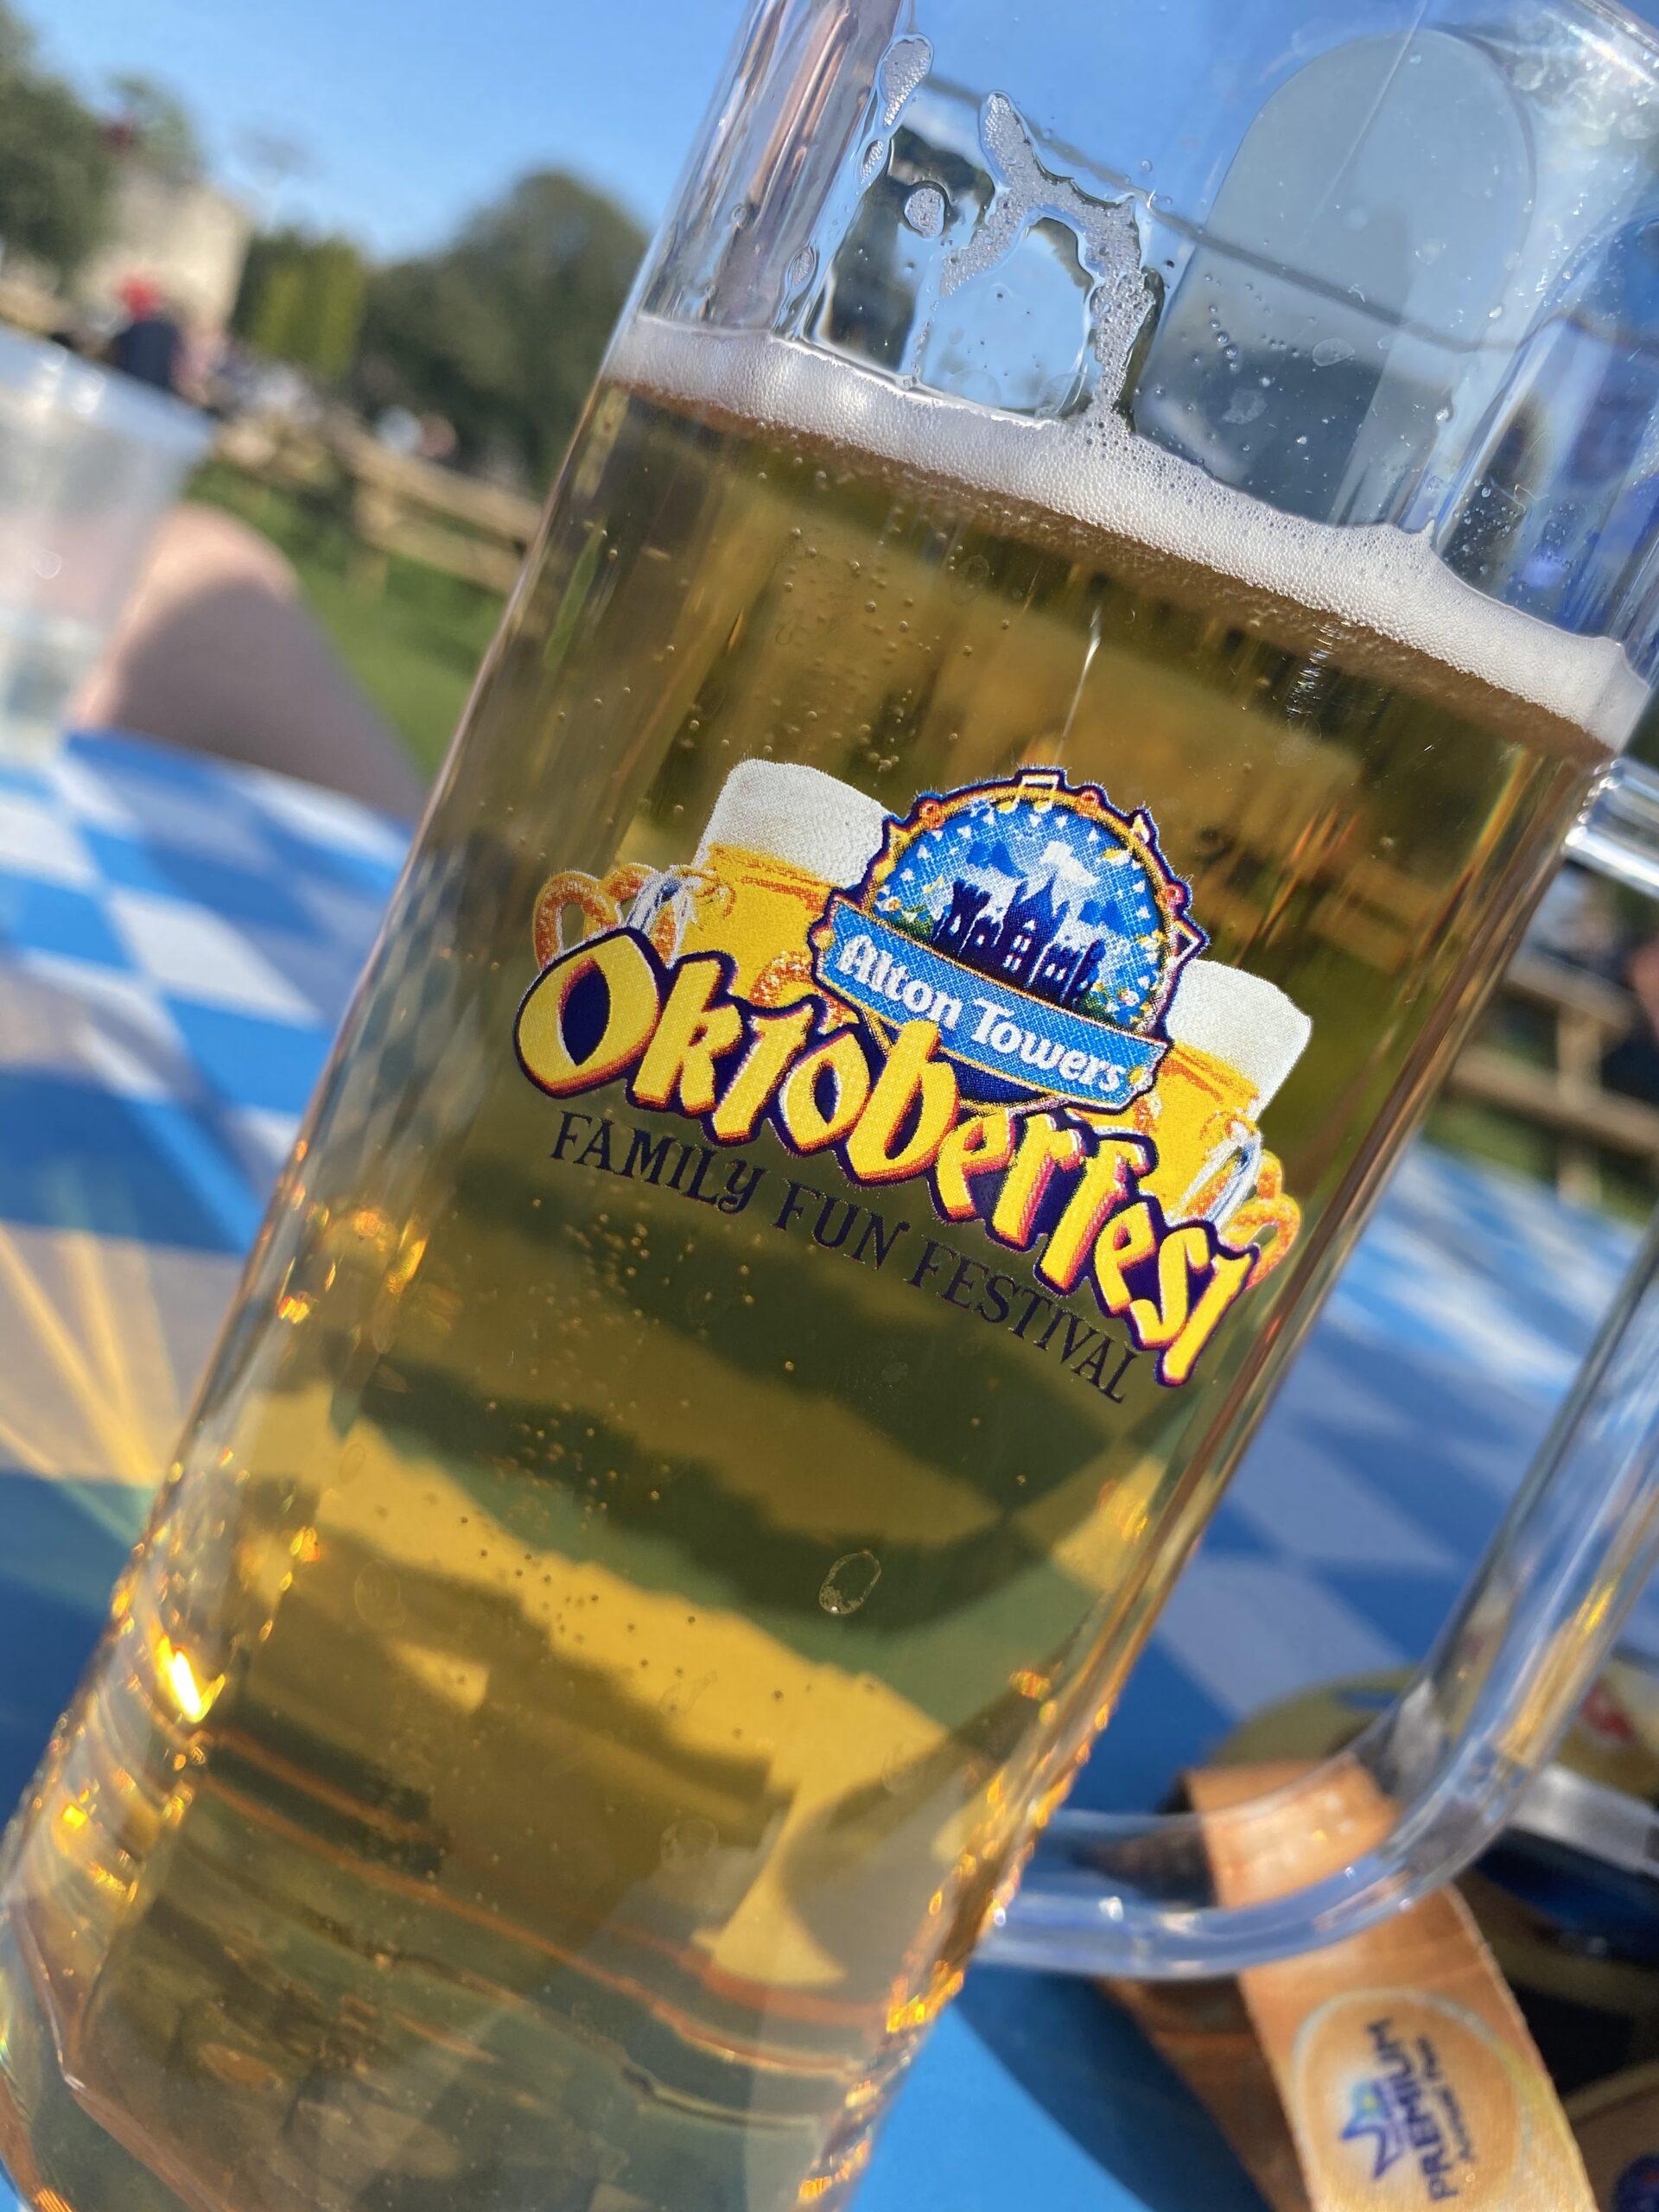 Trip Report: Oktoberfest- Alton Towers September 2020